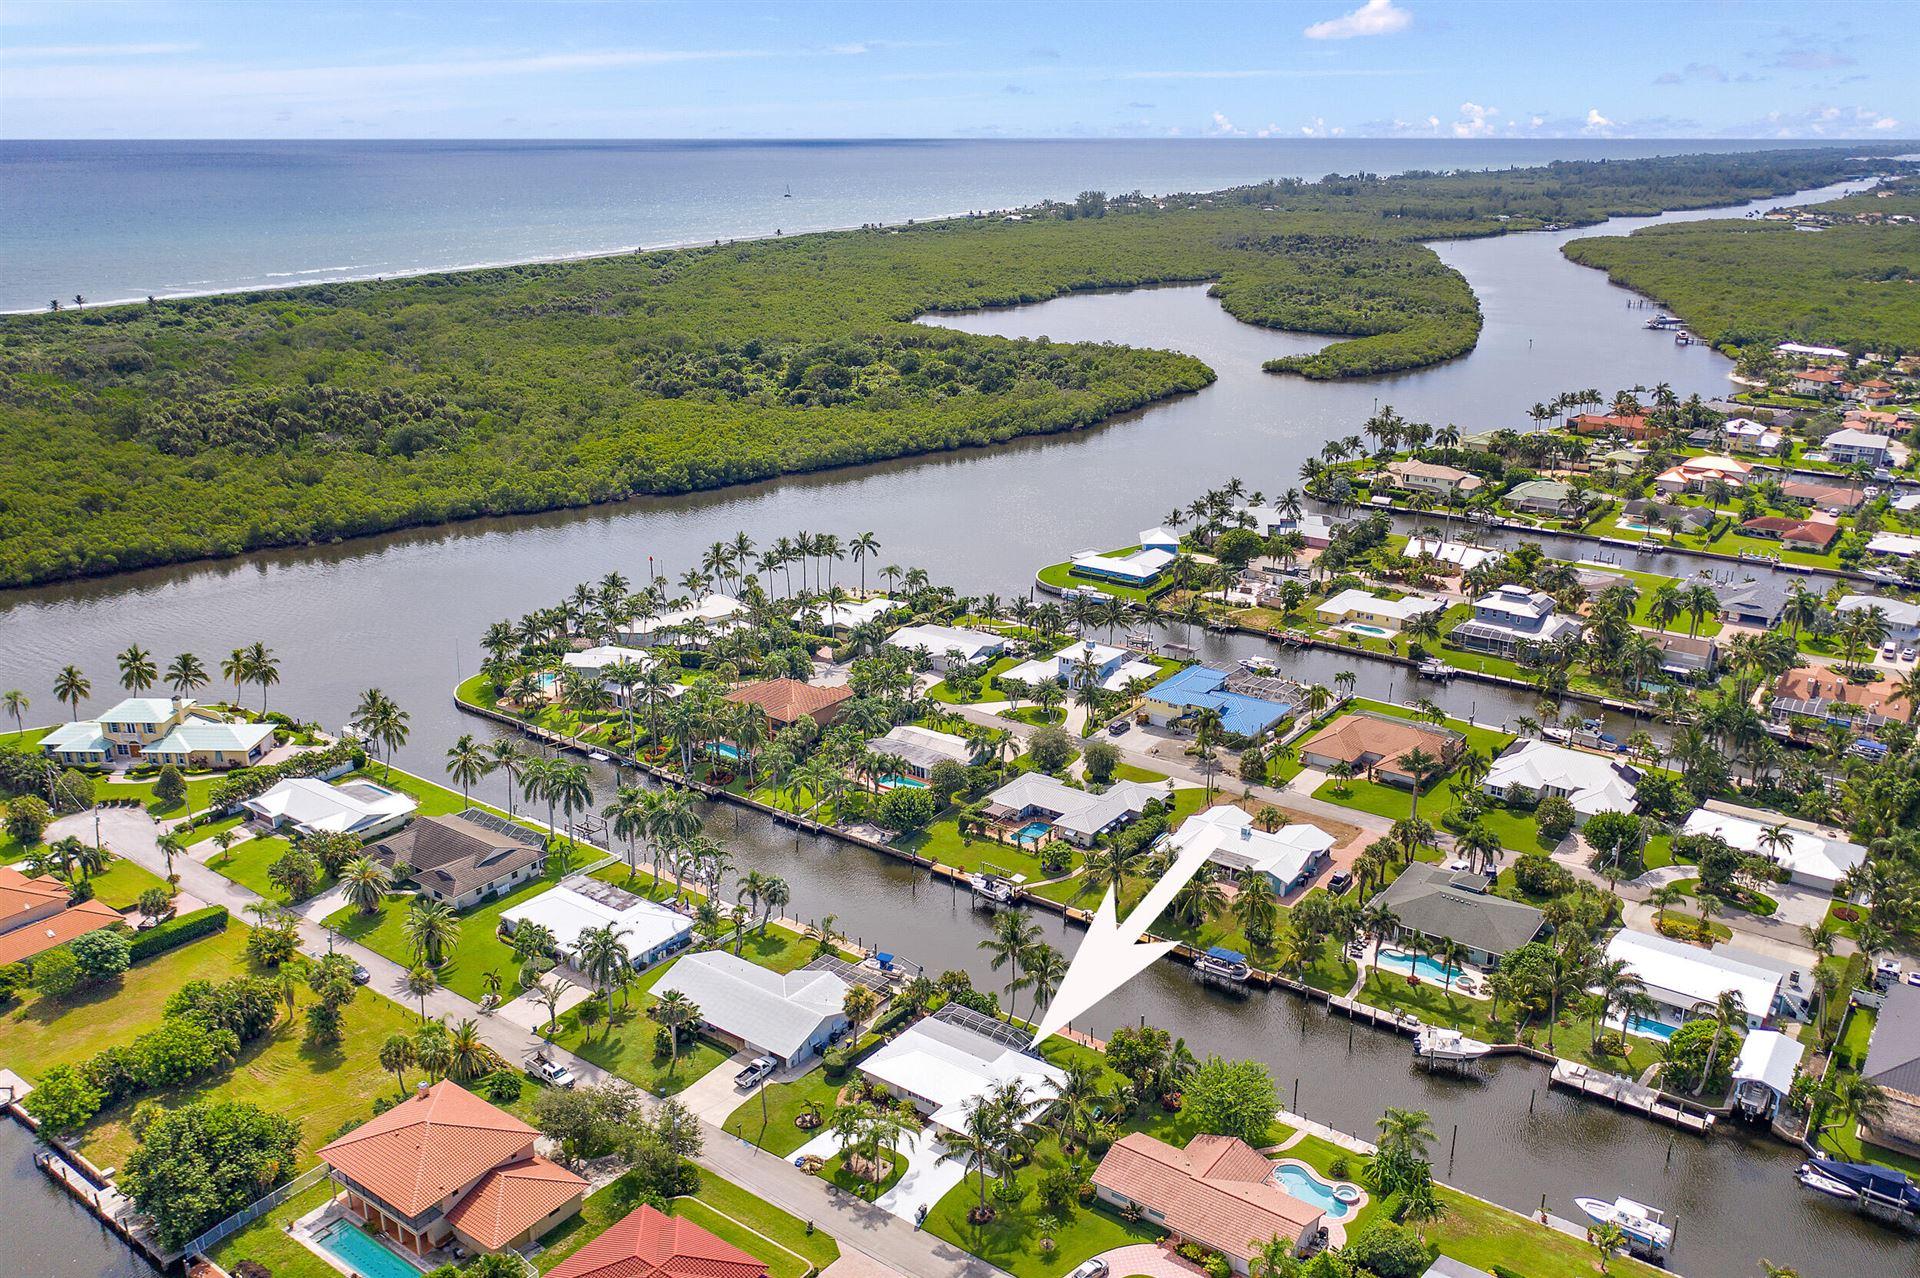 Photo of 8486 SE Palm Street, Hobe Sound, FL 33455 (MLS # RX-10744754)